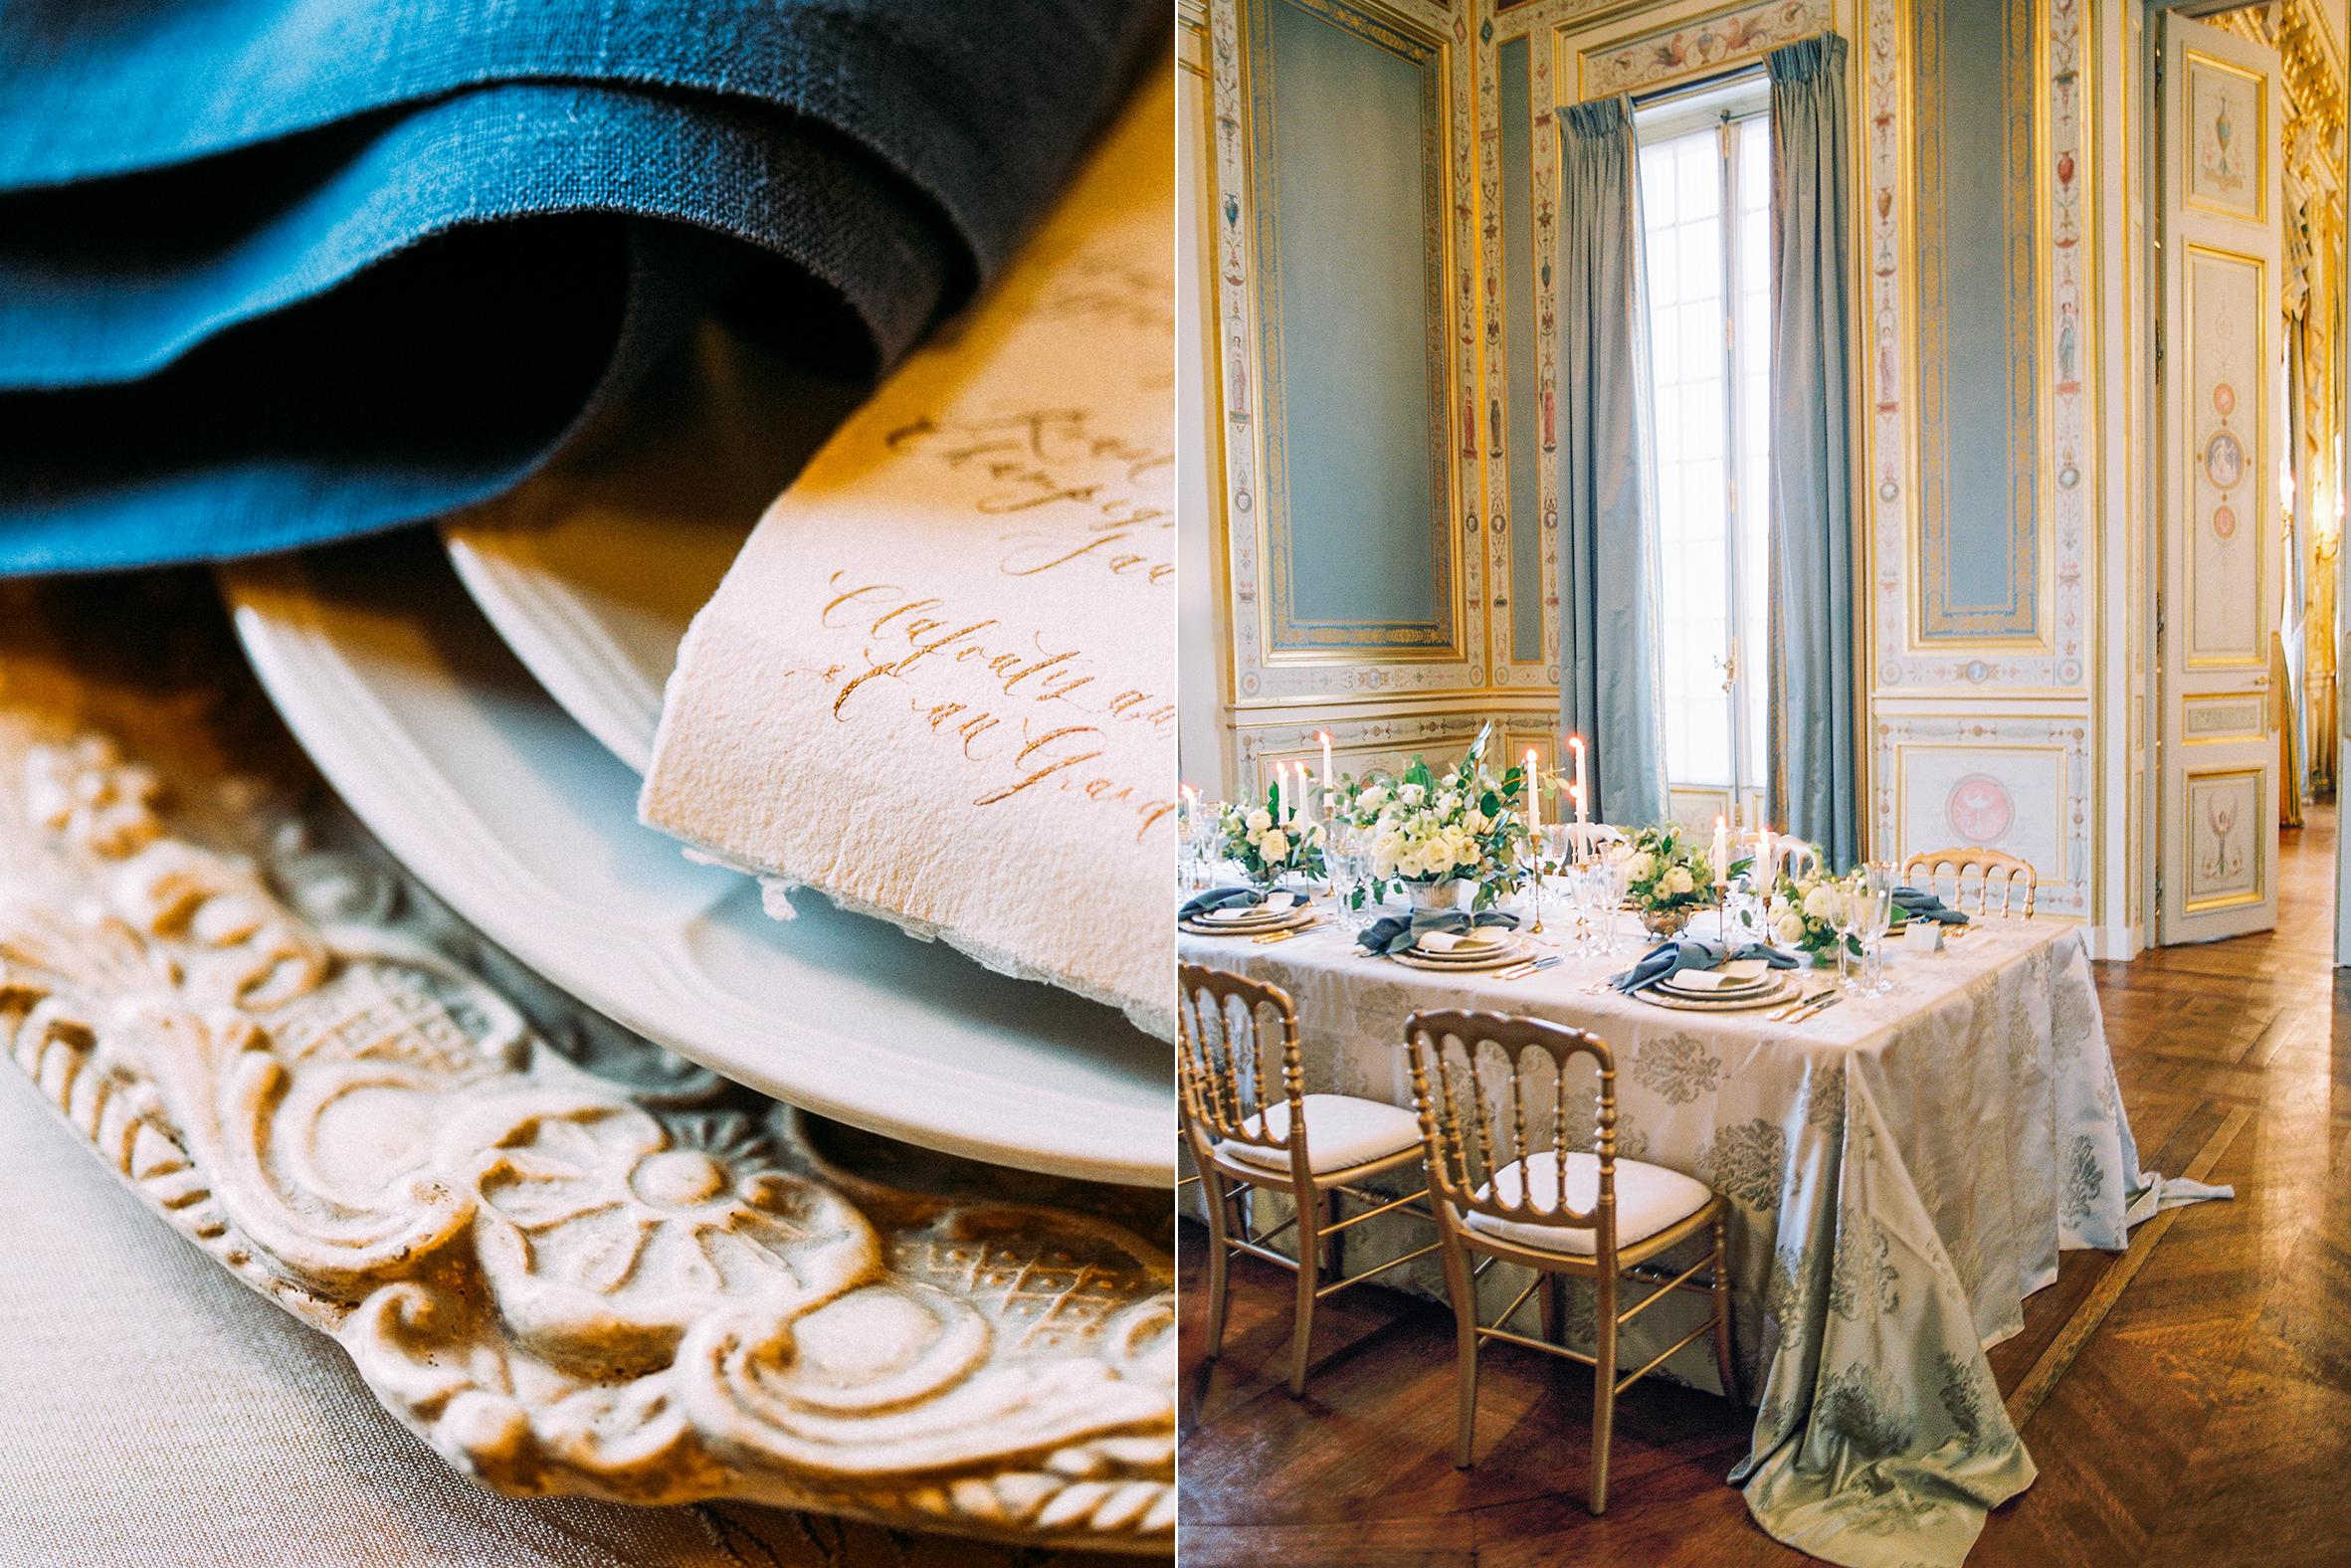 katie stoops photography-paris wedding-marchesa-cynthia martyn events10.jpg